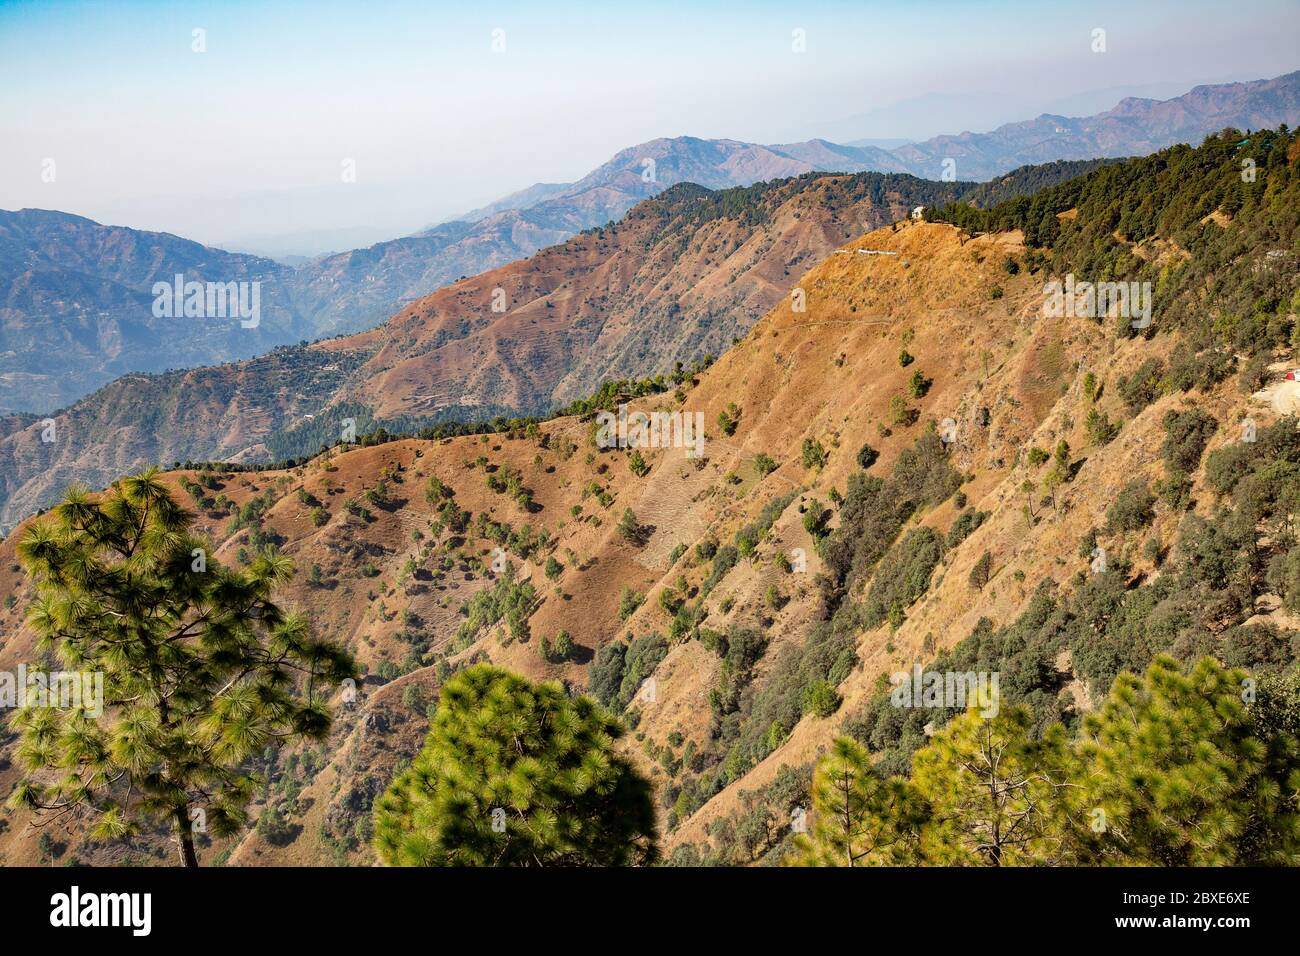 Mountain and valleys at Hill Station of Shimla,Himachal Pradesh,India Stock Photo